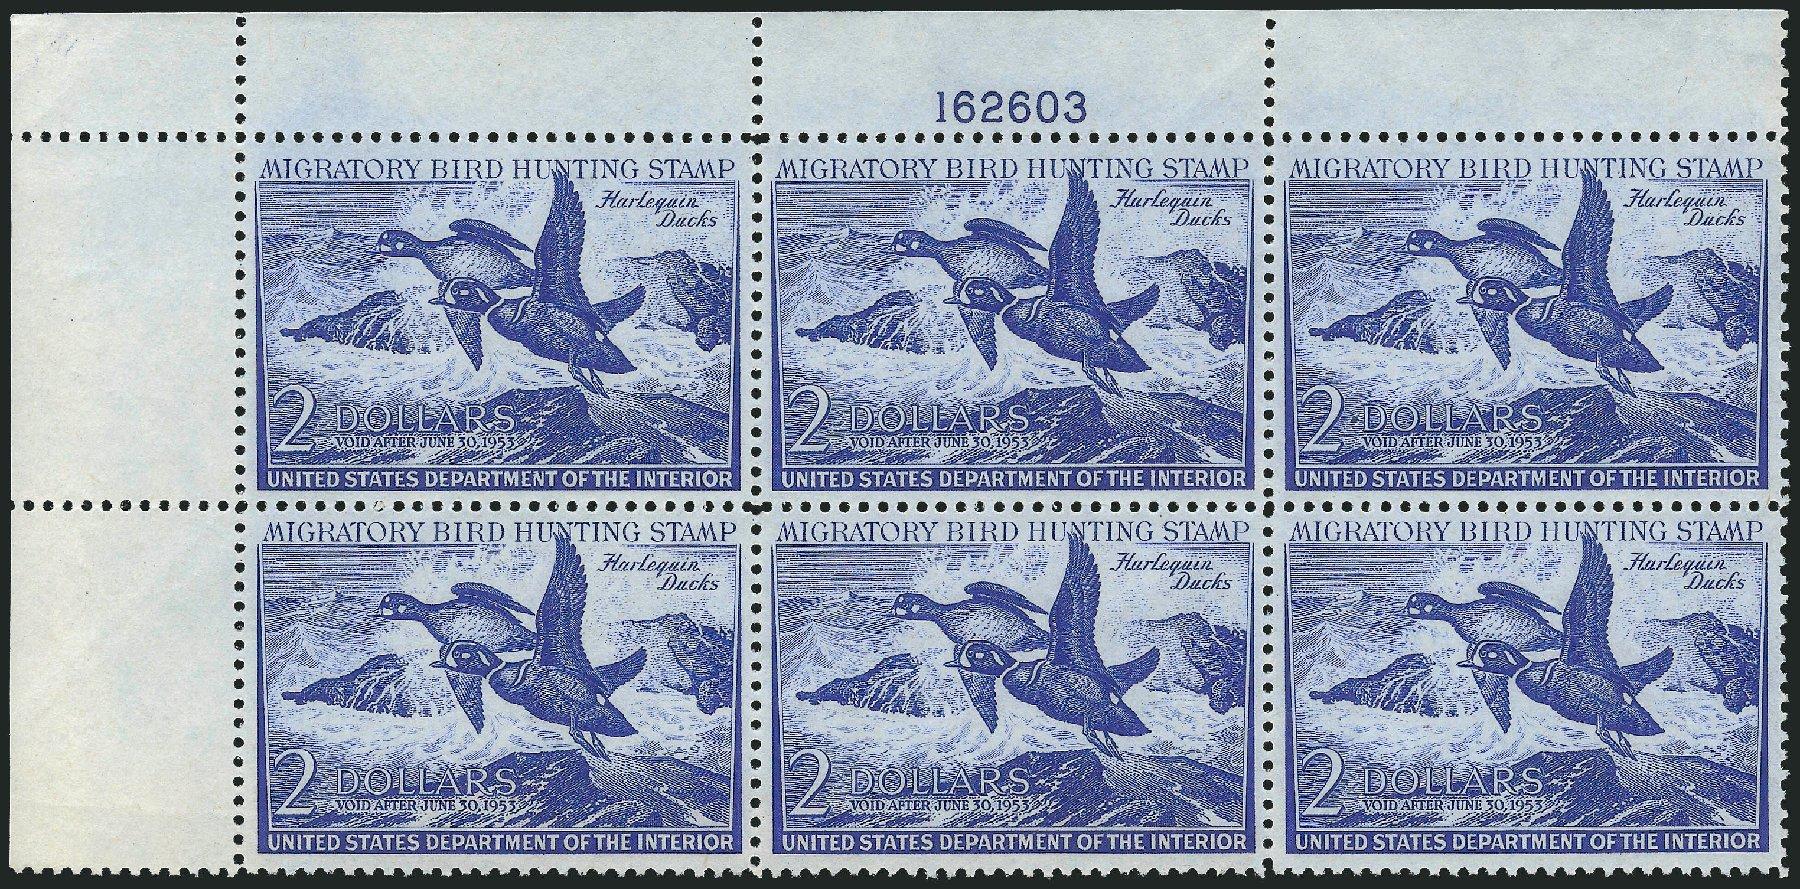 US Stamp Price Scott Catalog RW19 - 1952 US$2.00 Federal Duck Hunting. Robert Siegel Auction Galleries, Oct 2014, Sale 1082, Lot 547